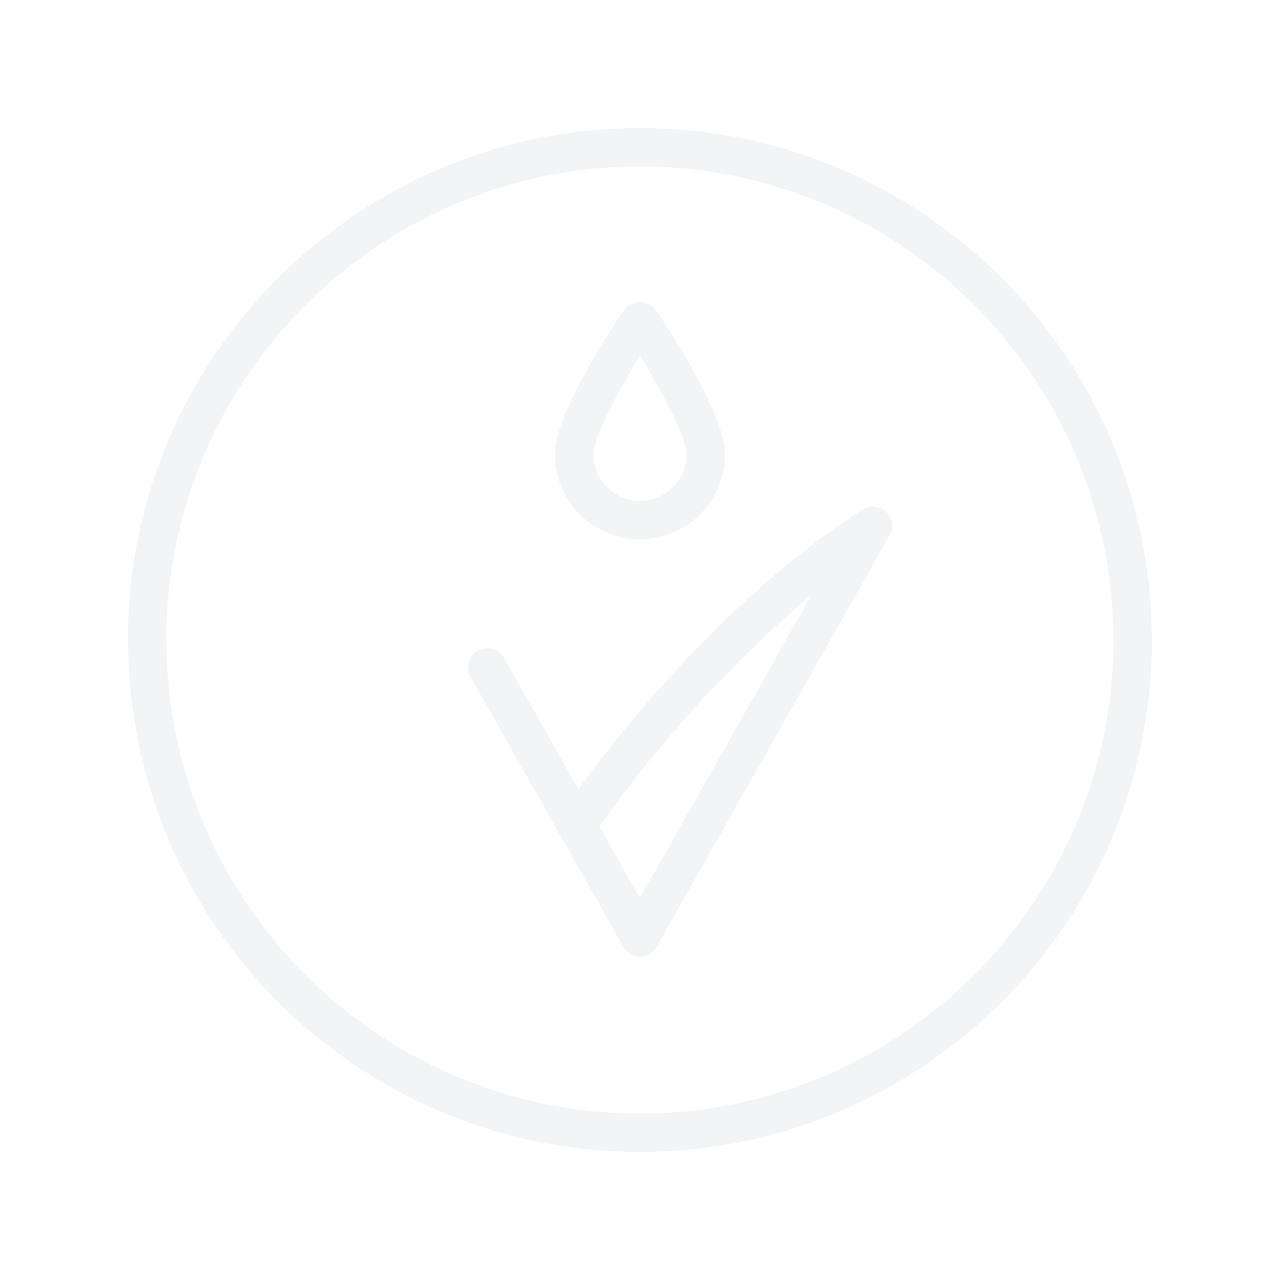 Lily Lolo Mineral Finishing Powder Flawless Silk 4.5g